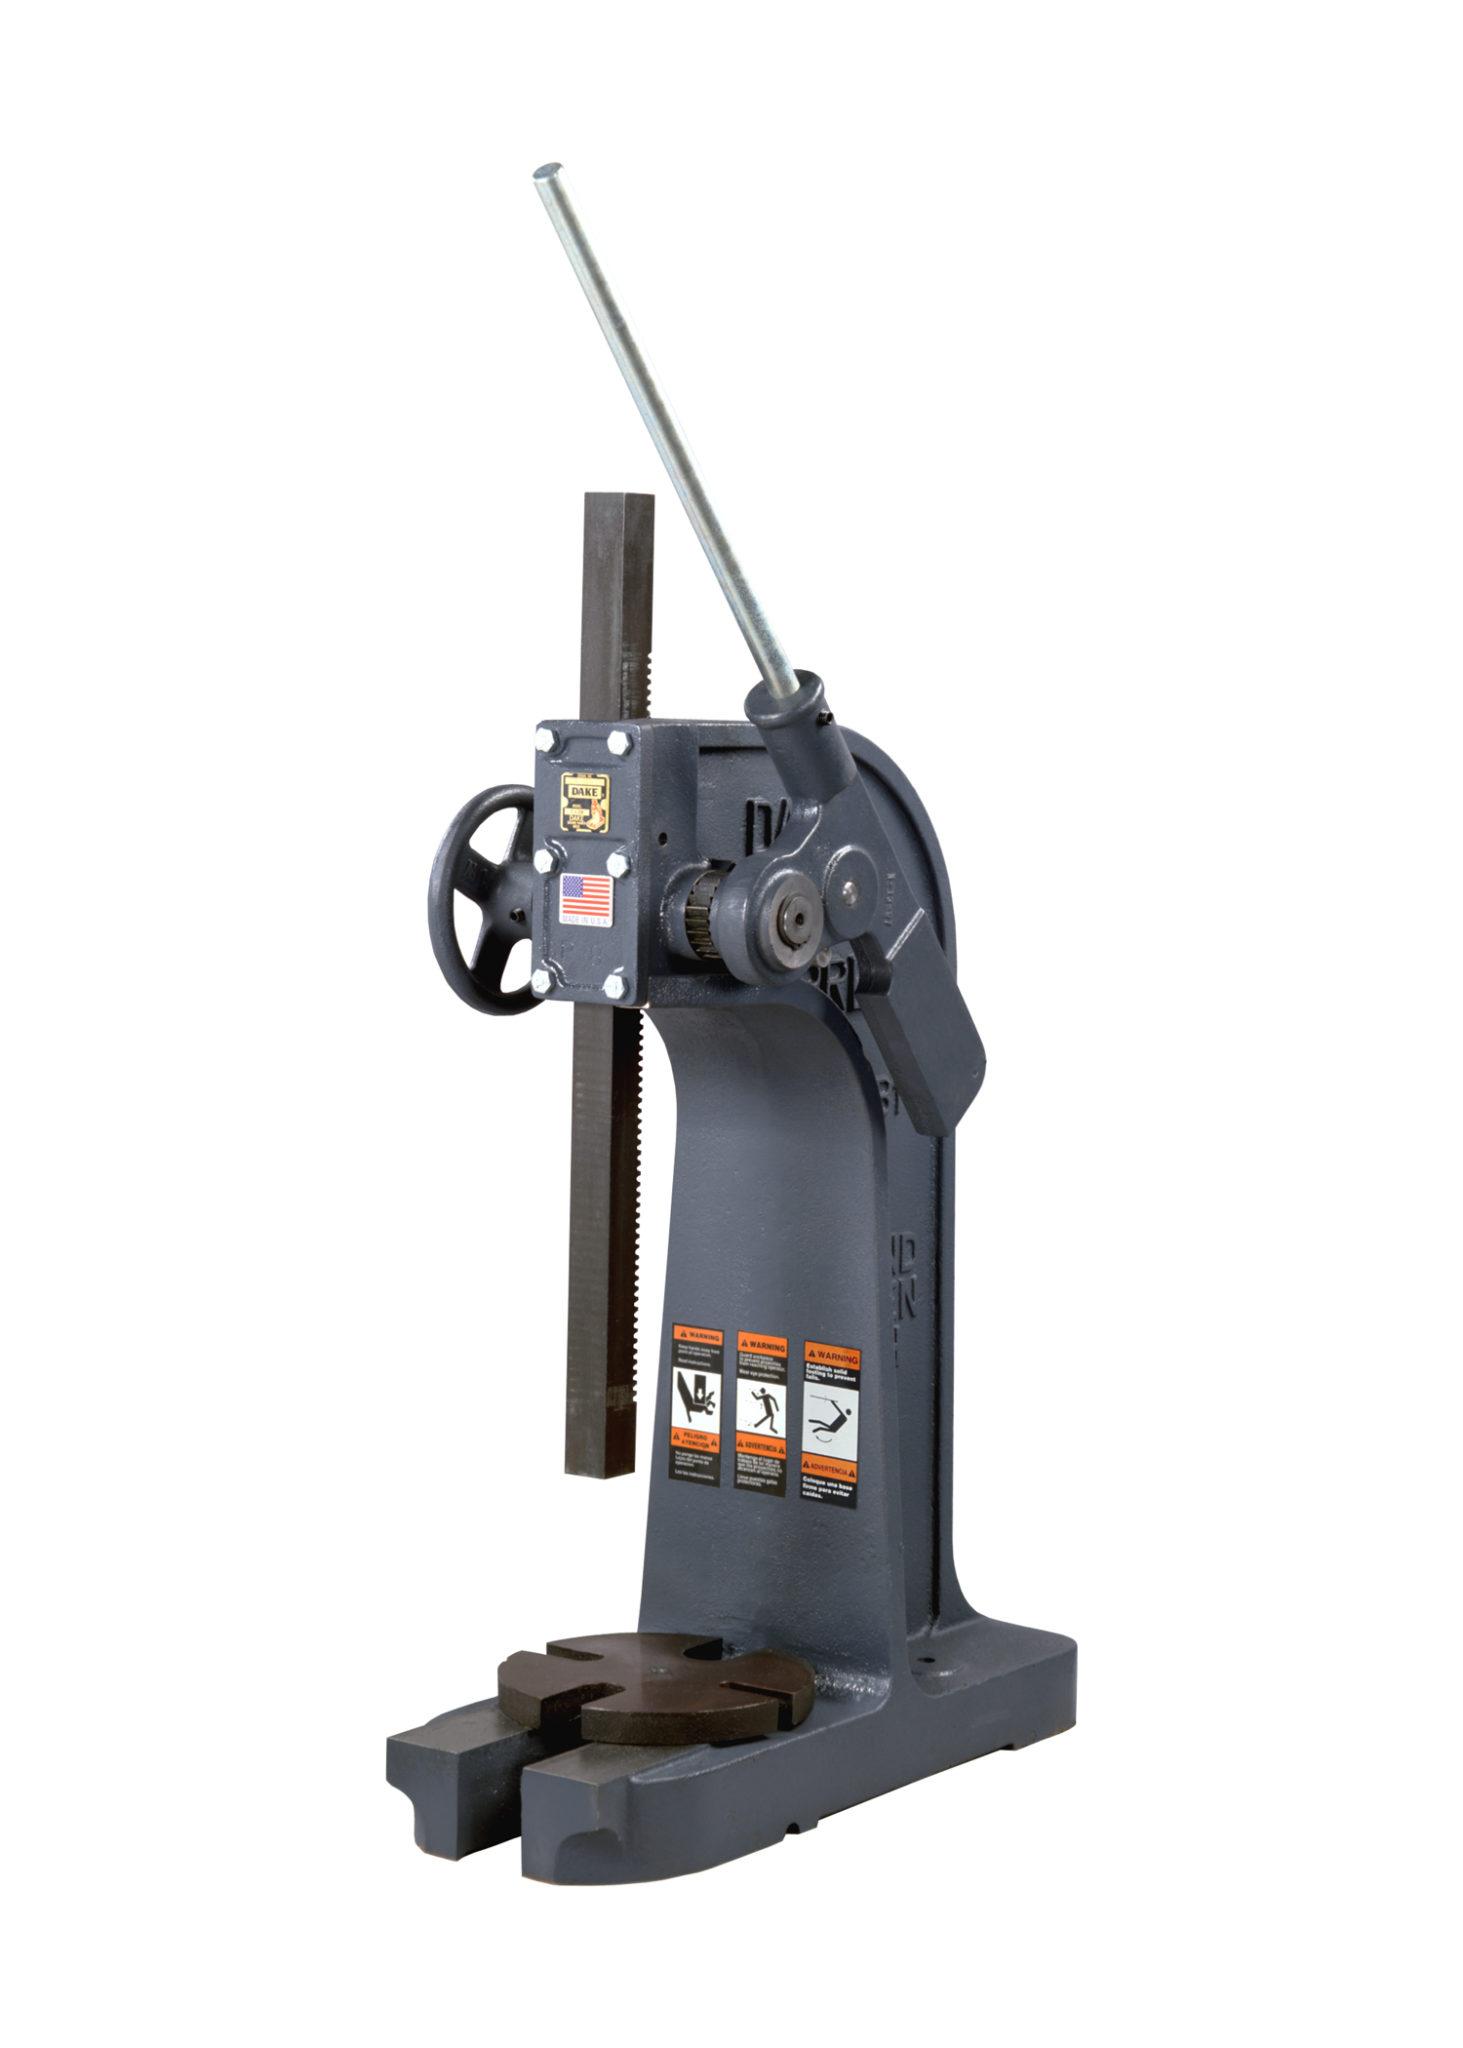 Vertical Lever Press : Dake ton ratchet lever arbor press model b new